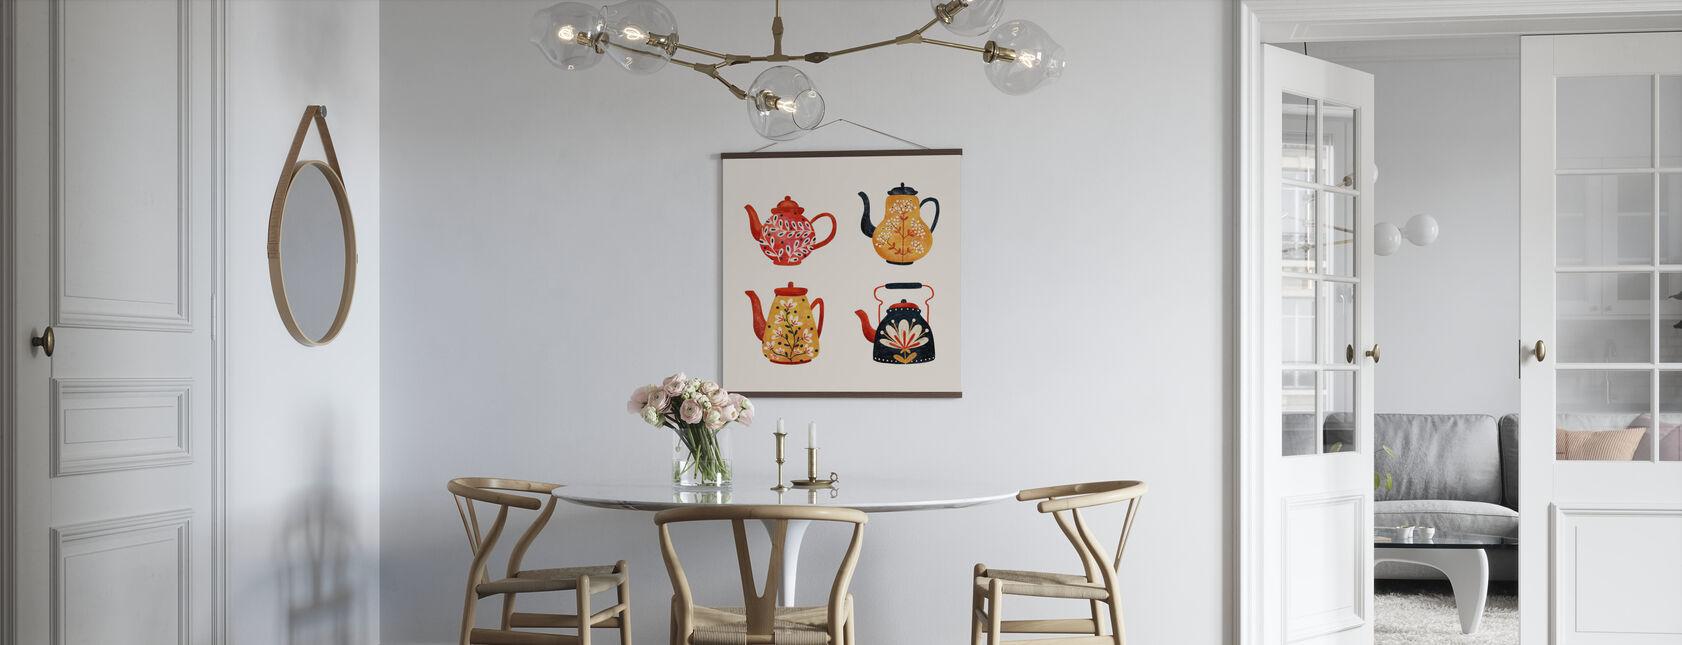 Tekannor - Poster - Kök